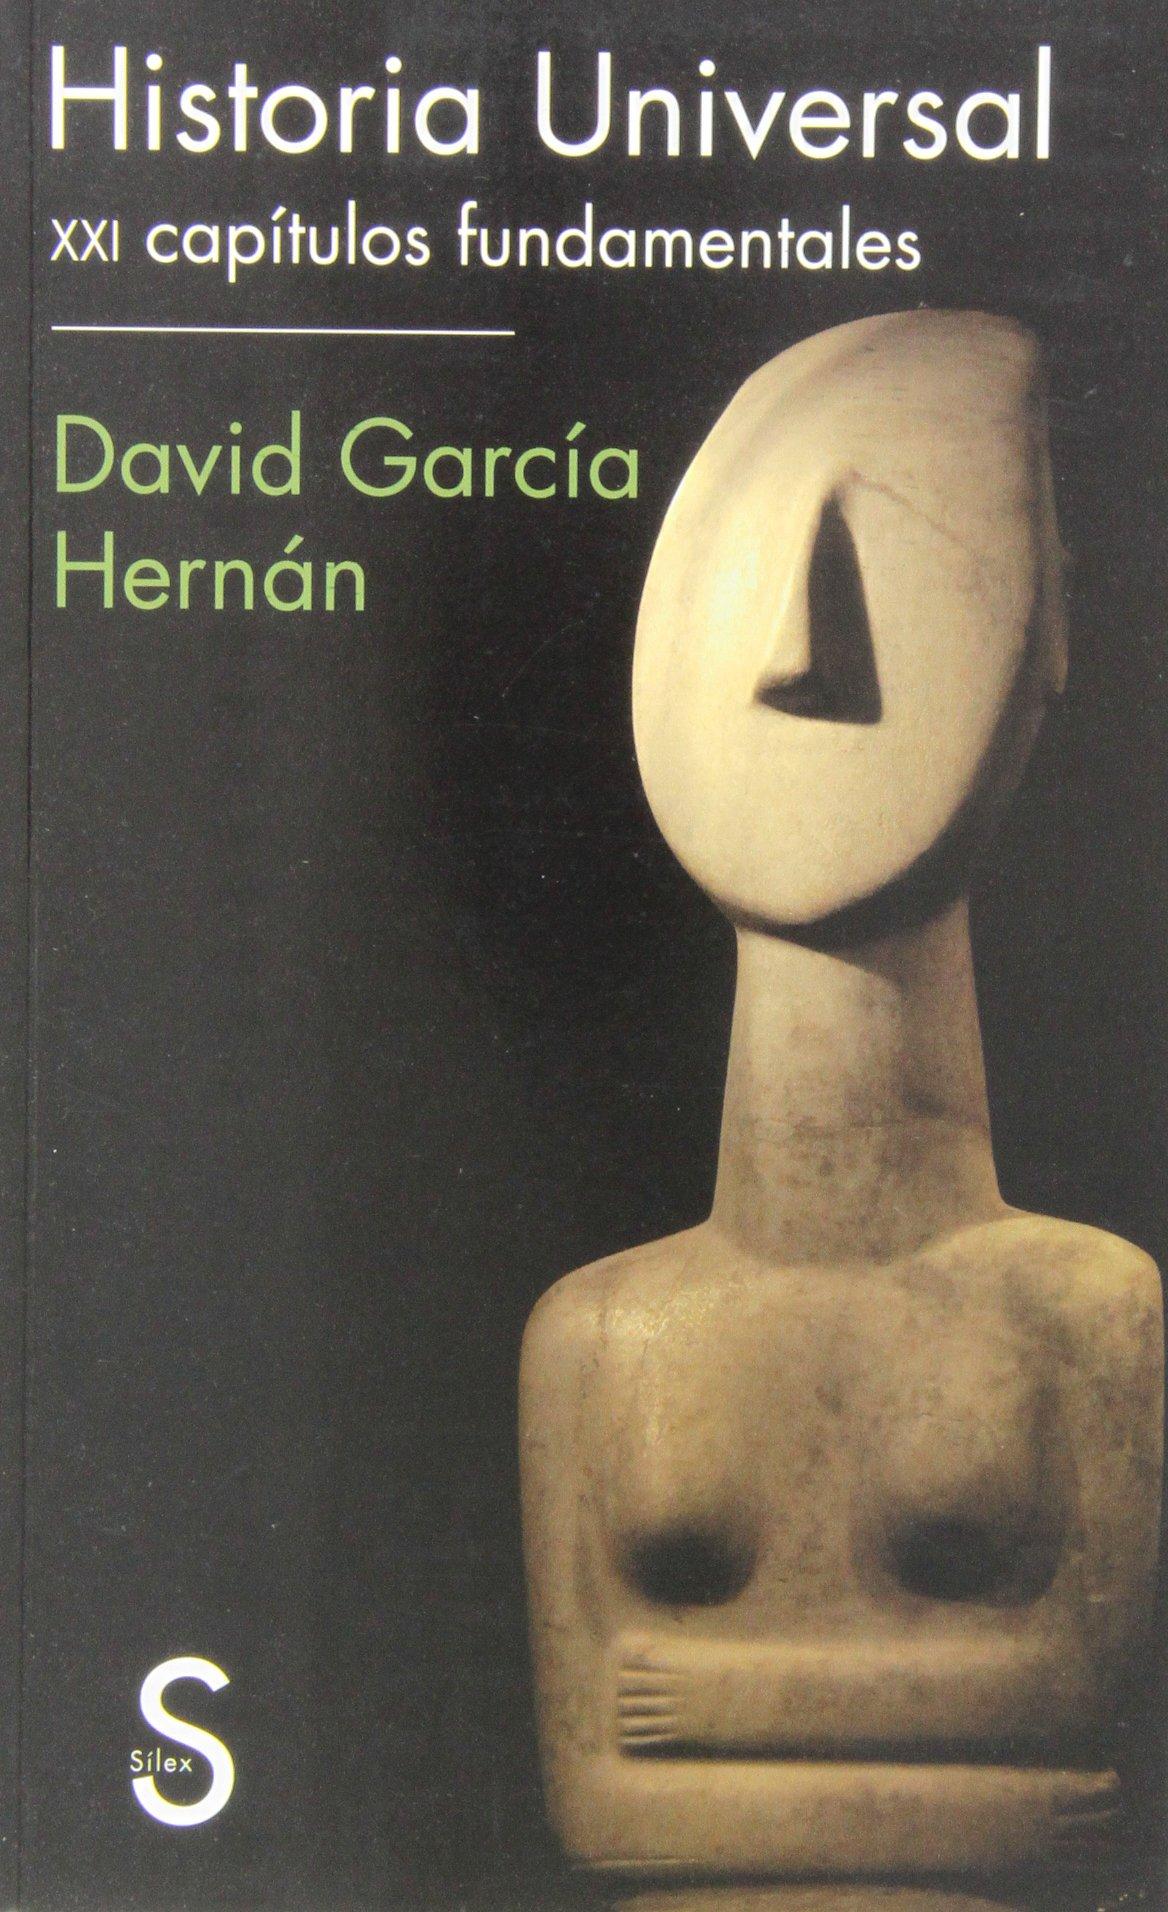 Historia Universal: XXI capítulos fundamentales: Amazon.es: García Hernán, David, Pineda Torra, Cristina, Carro Pérez, Joana, Domínguez Hernanz, Ramiro: Libros